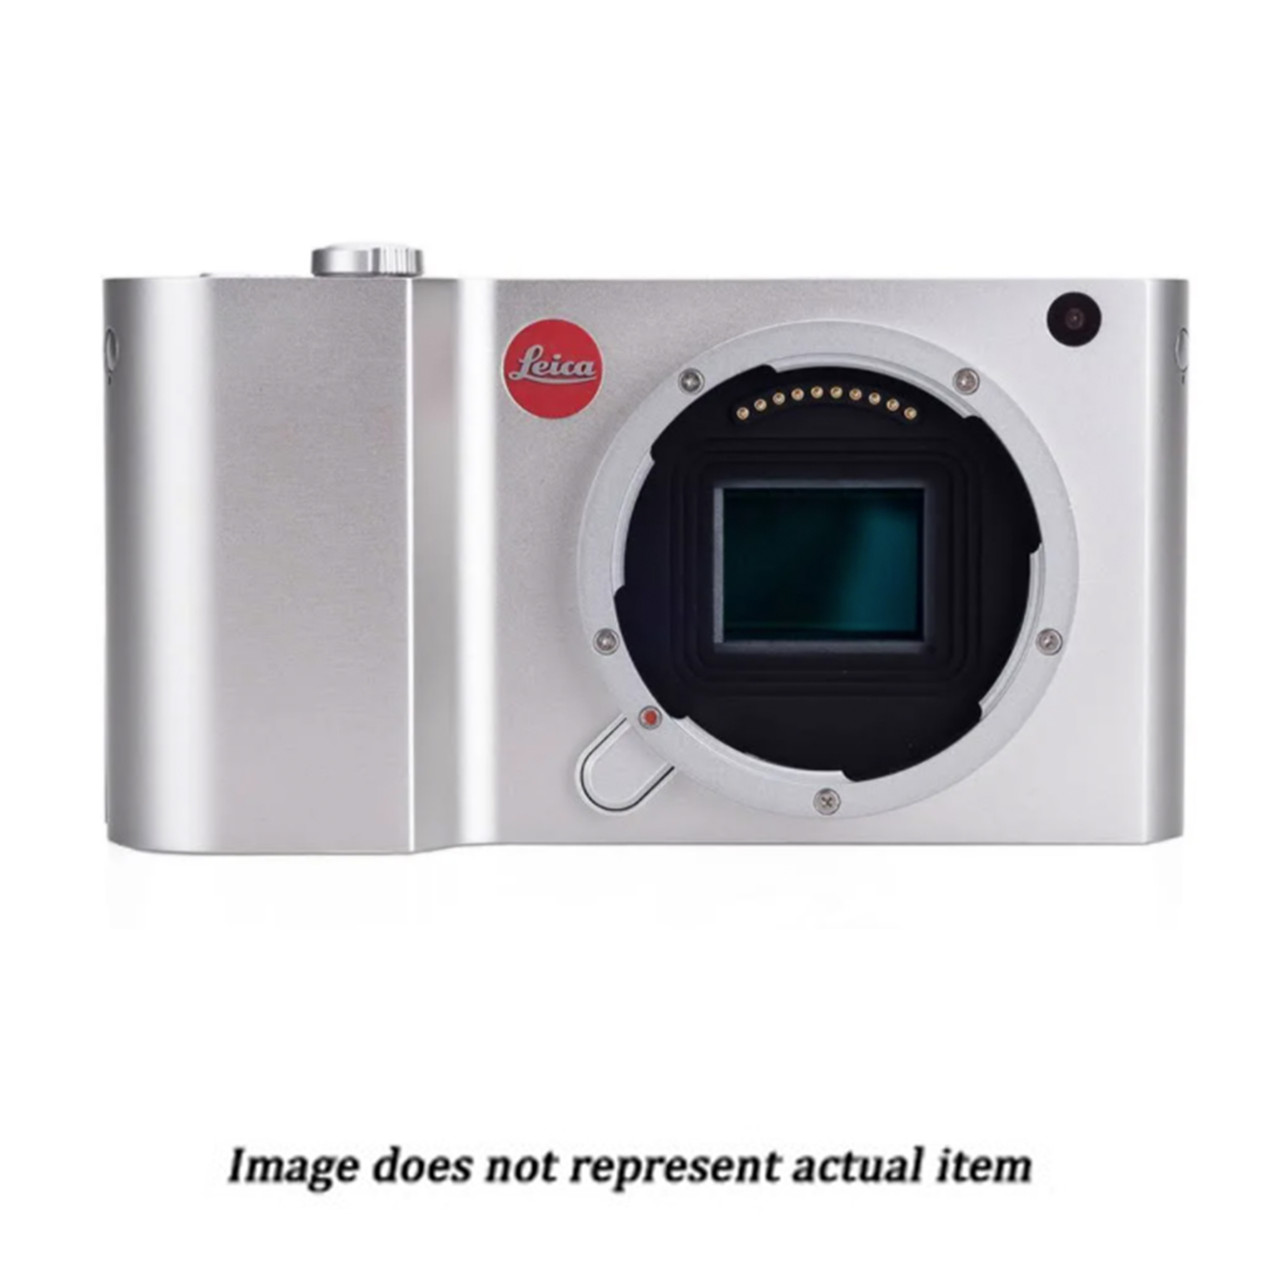 Leica T Mirrorless Digital Camera Body (USED) - S/N 4816508